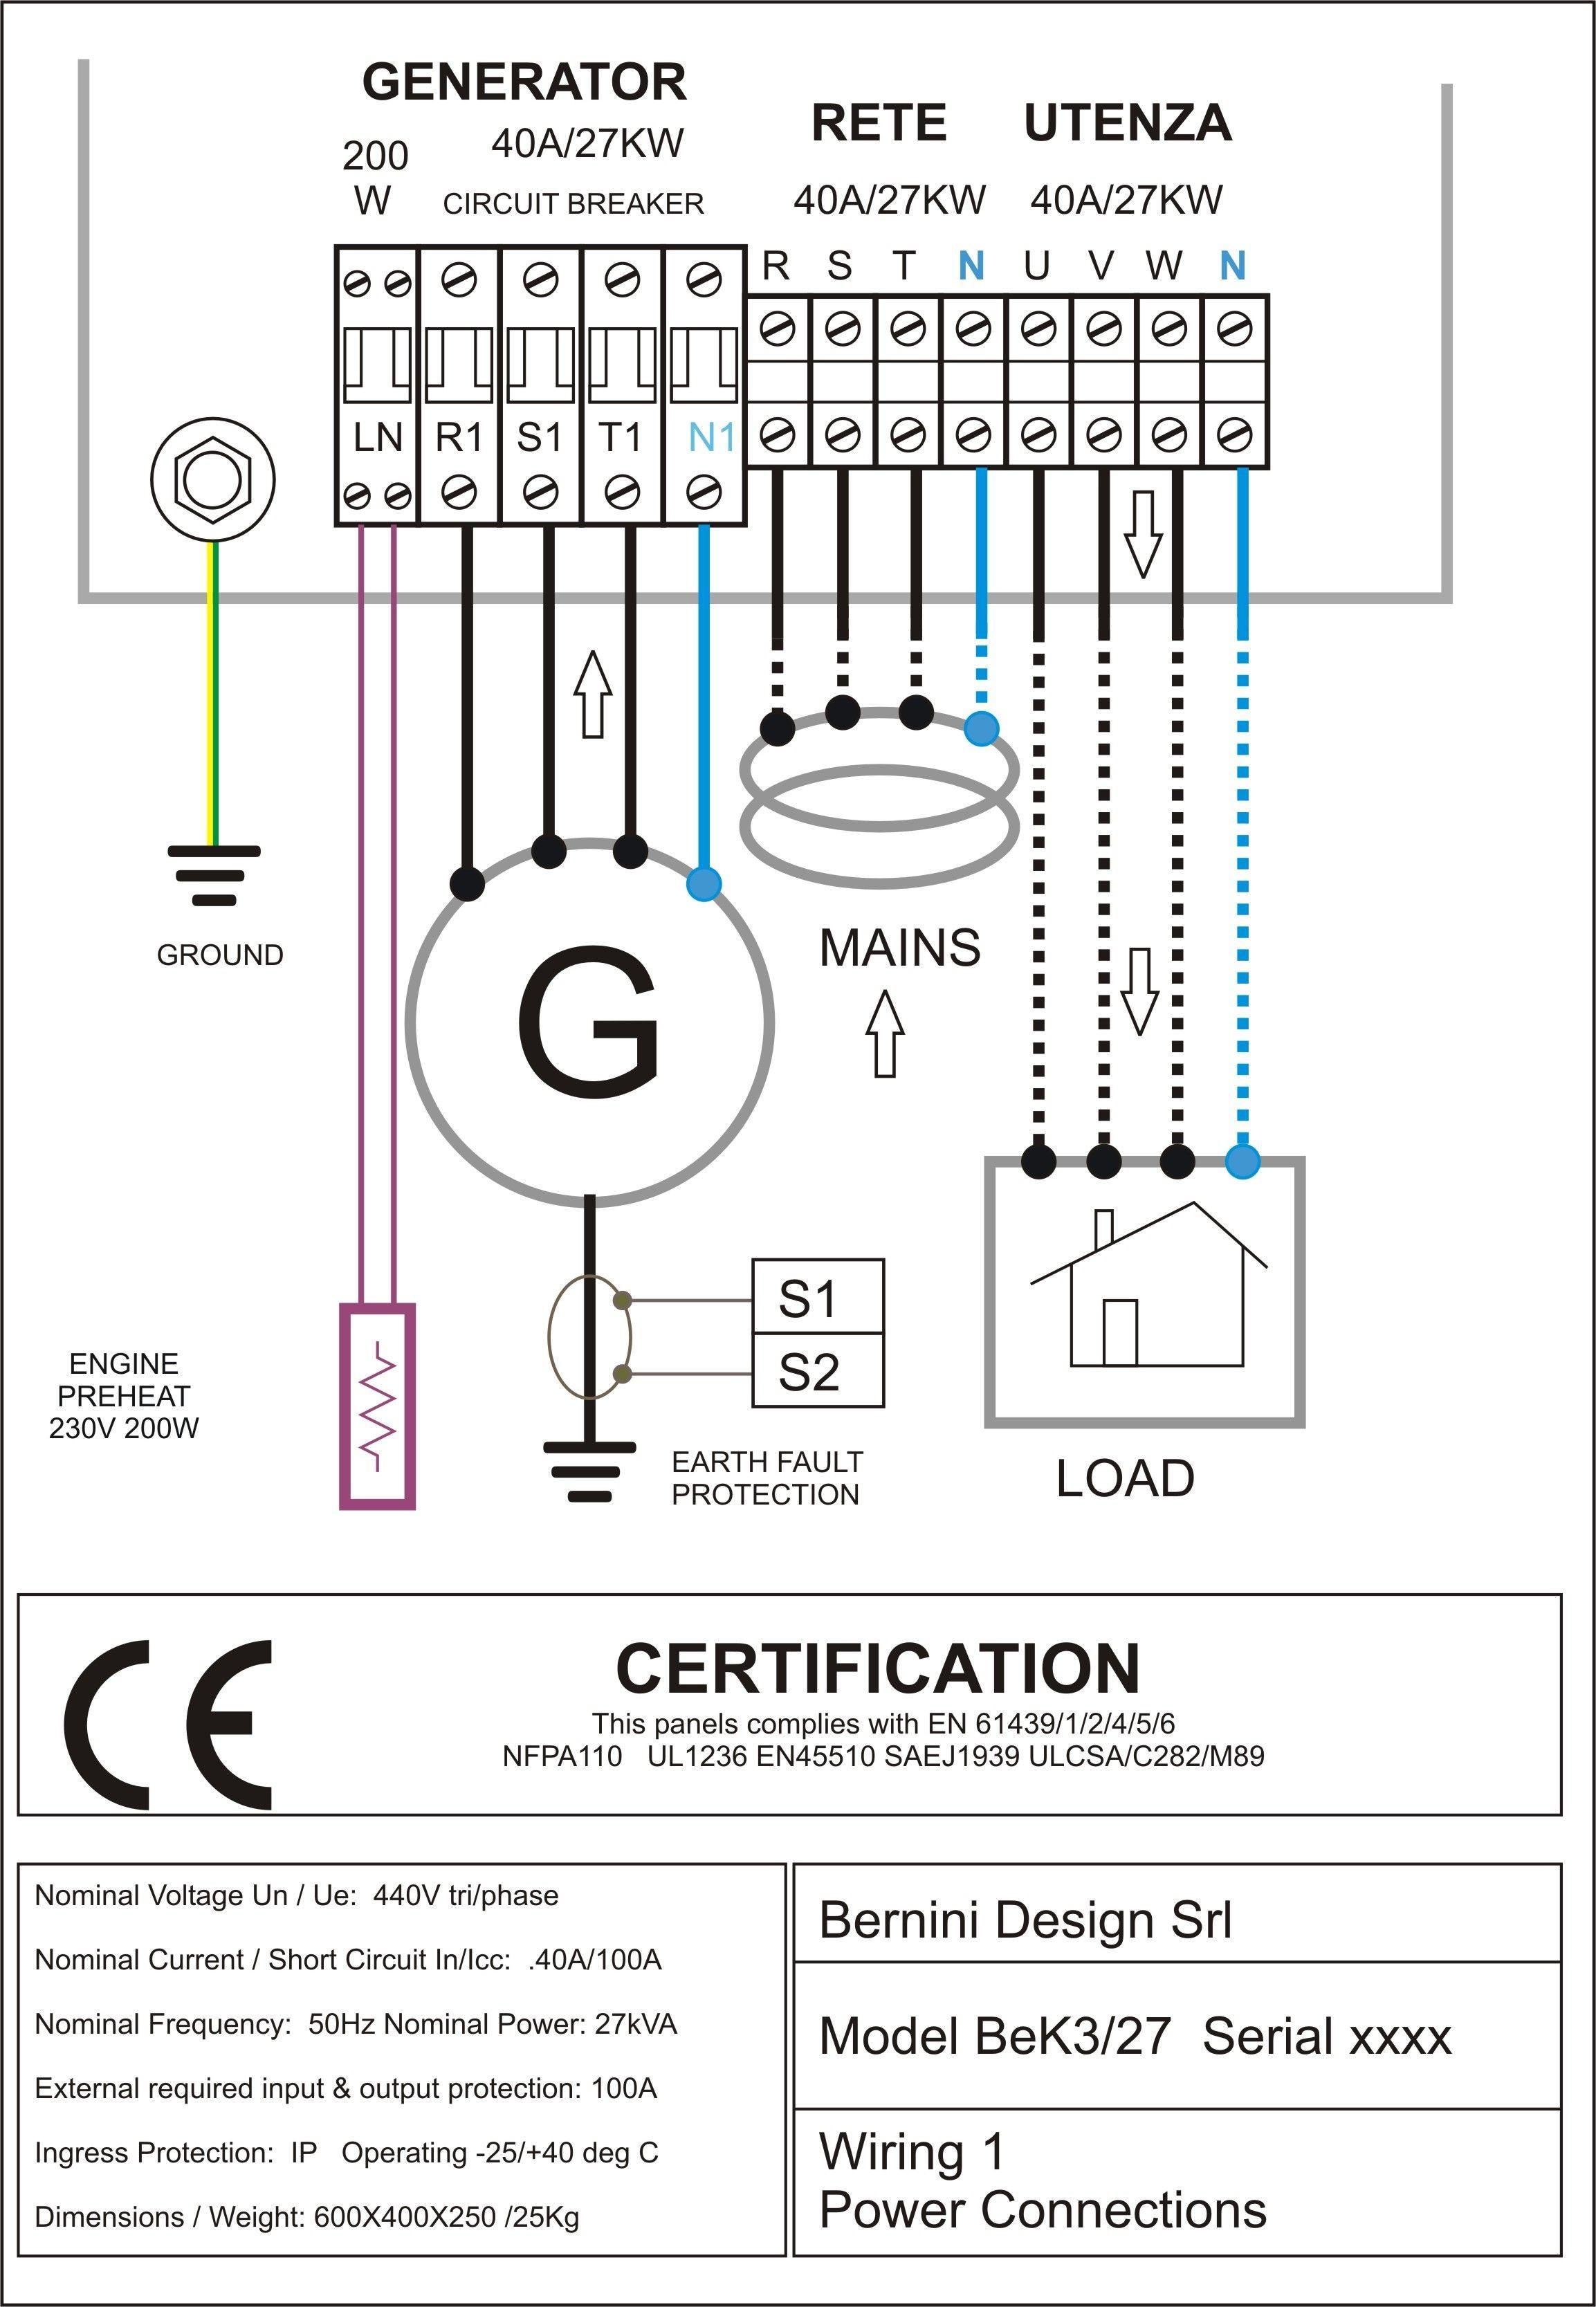 Diesel Engine Starter Wiring Diagram Sel Generator Control Panel Wiring Diagram Ac Connections Of Diesel Engine Starter Wiring Diagram